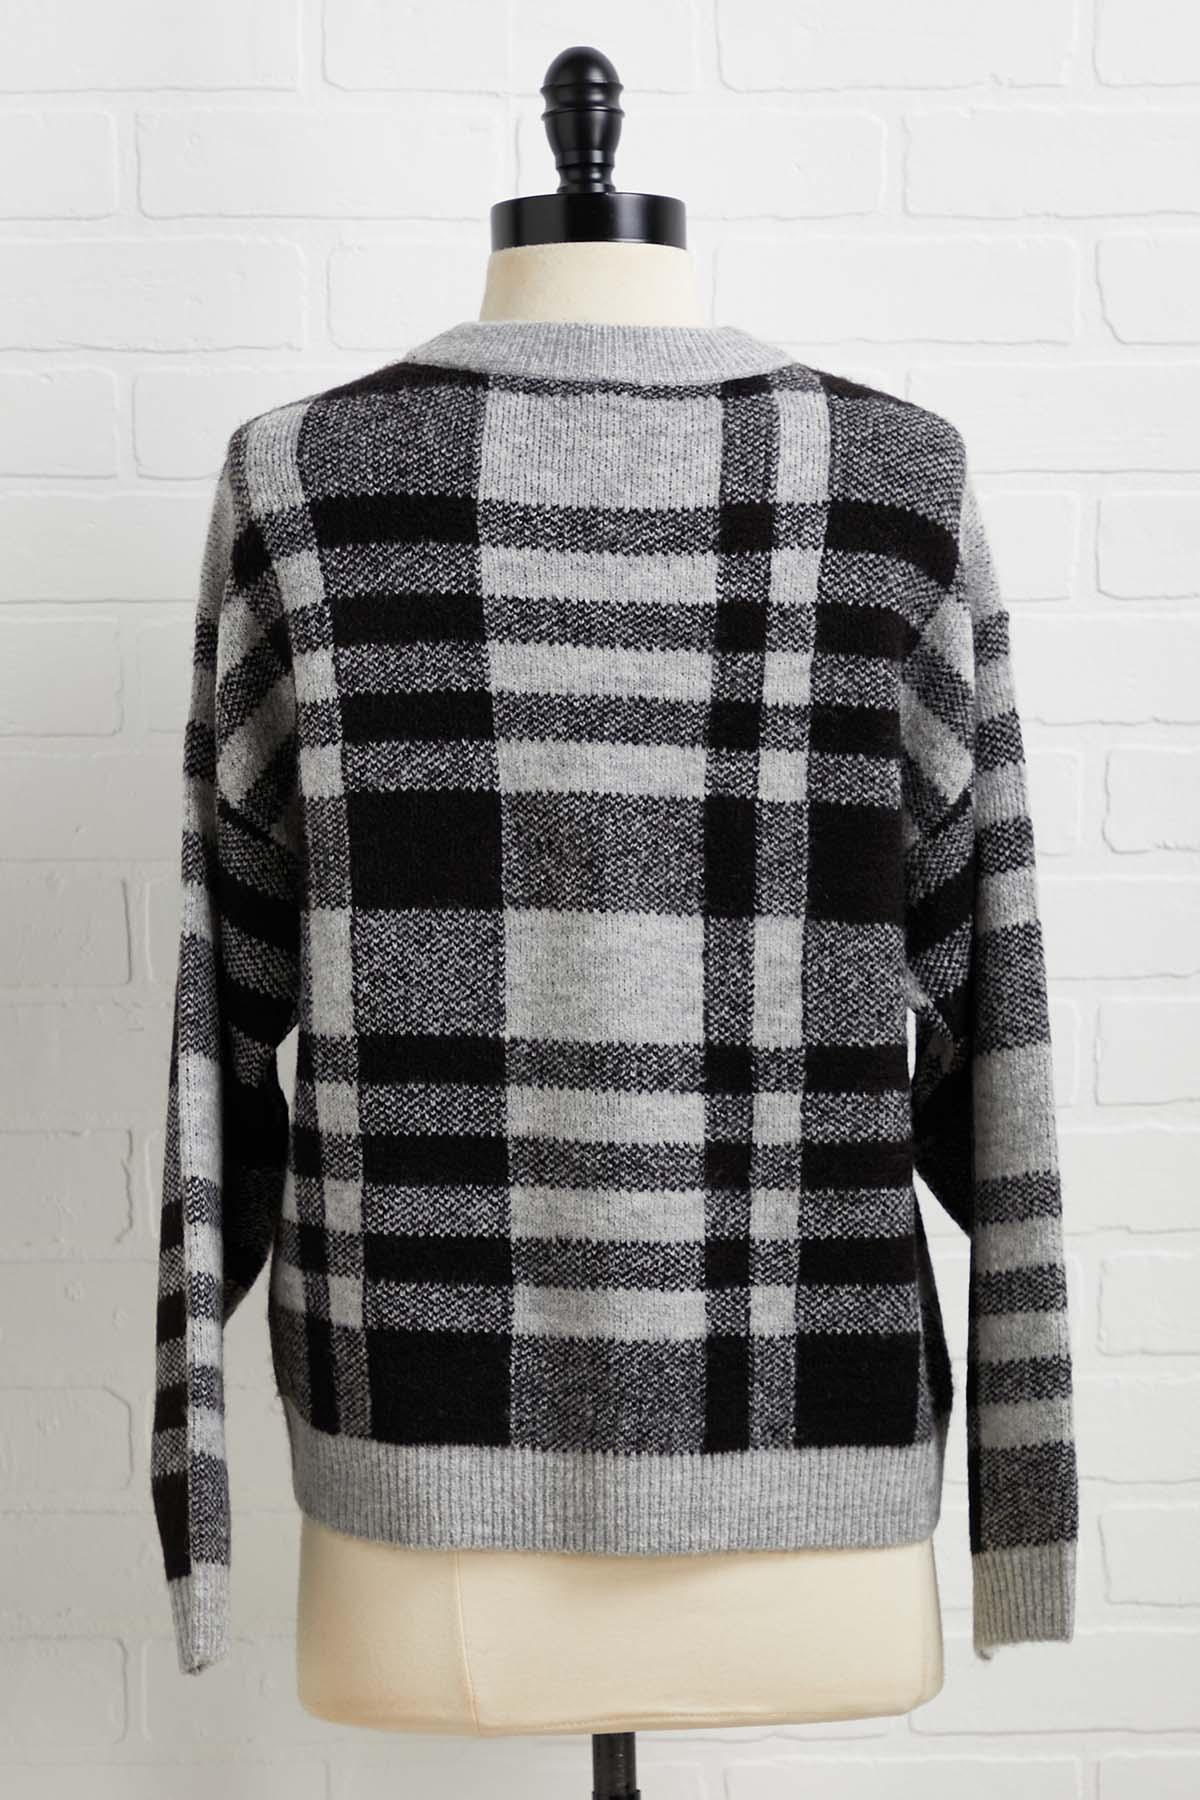 In Between The Lines Sweater